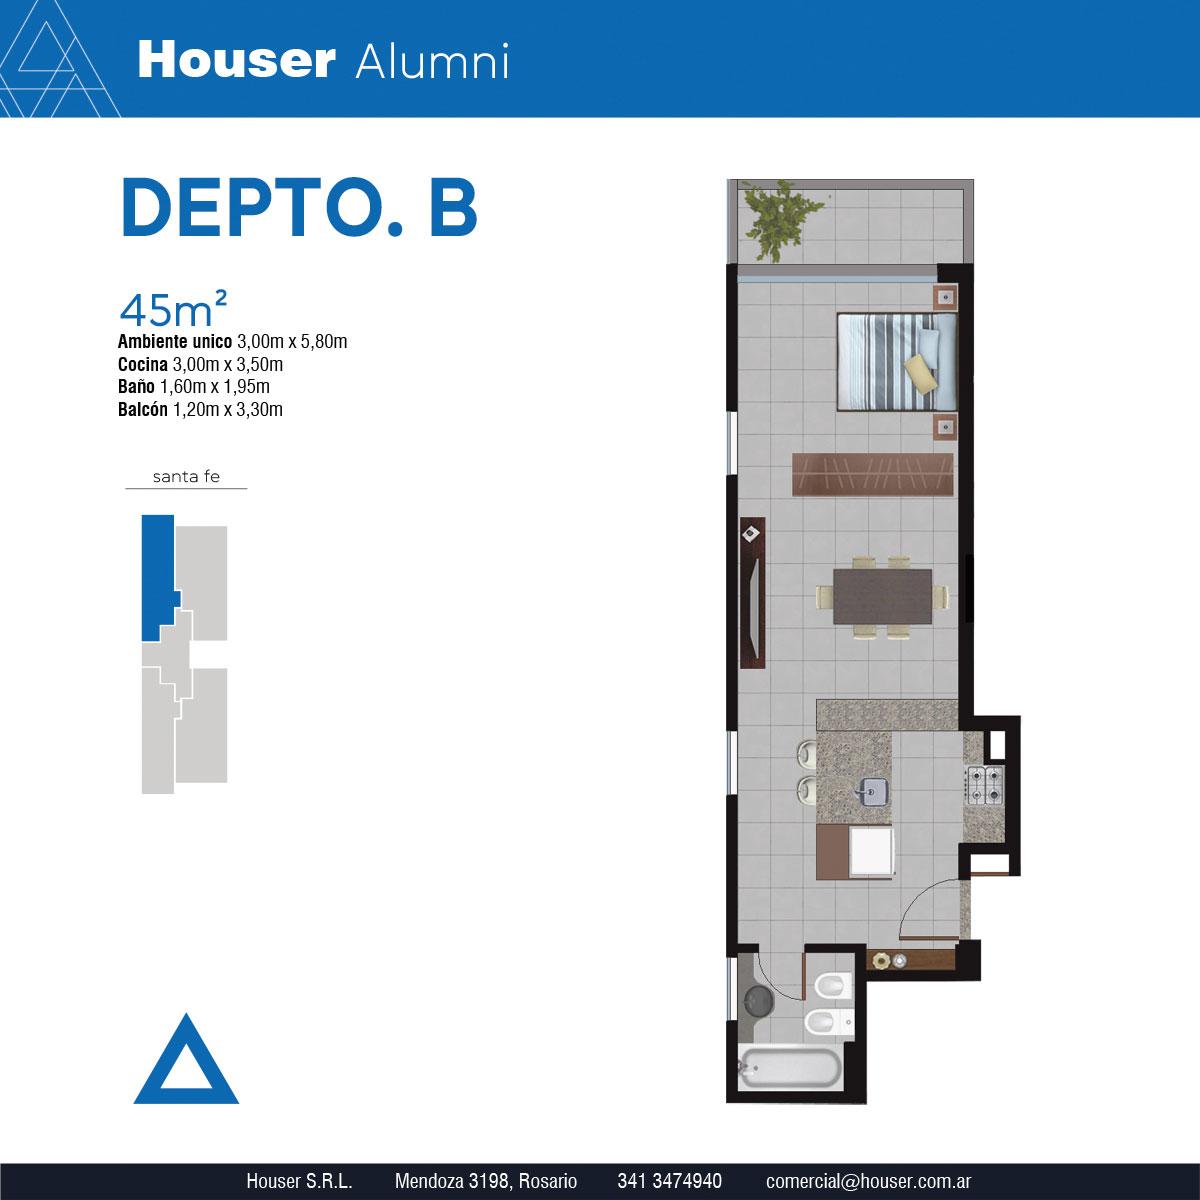 Plantas Houser Alumni - Departamento B